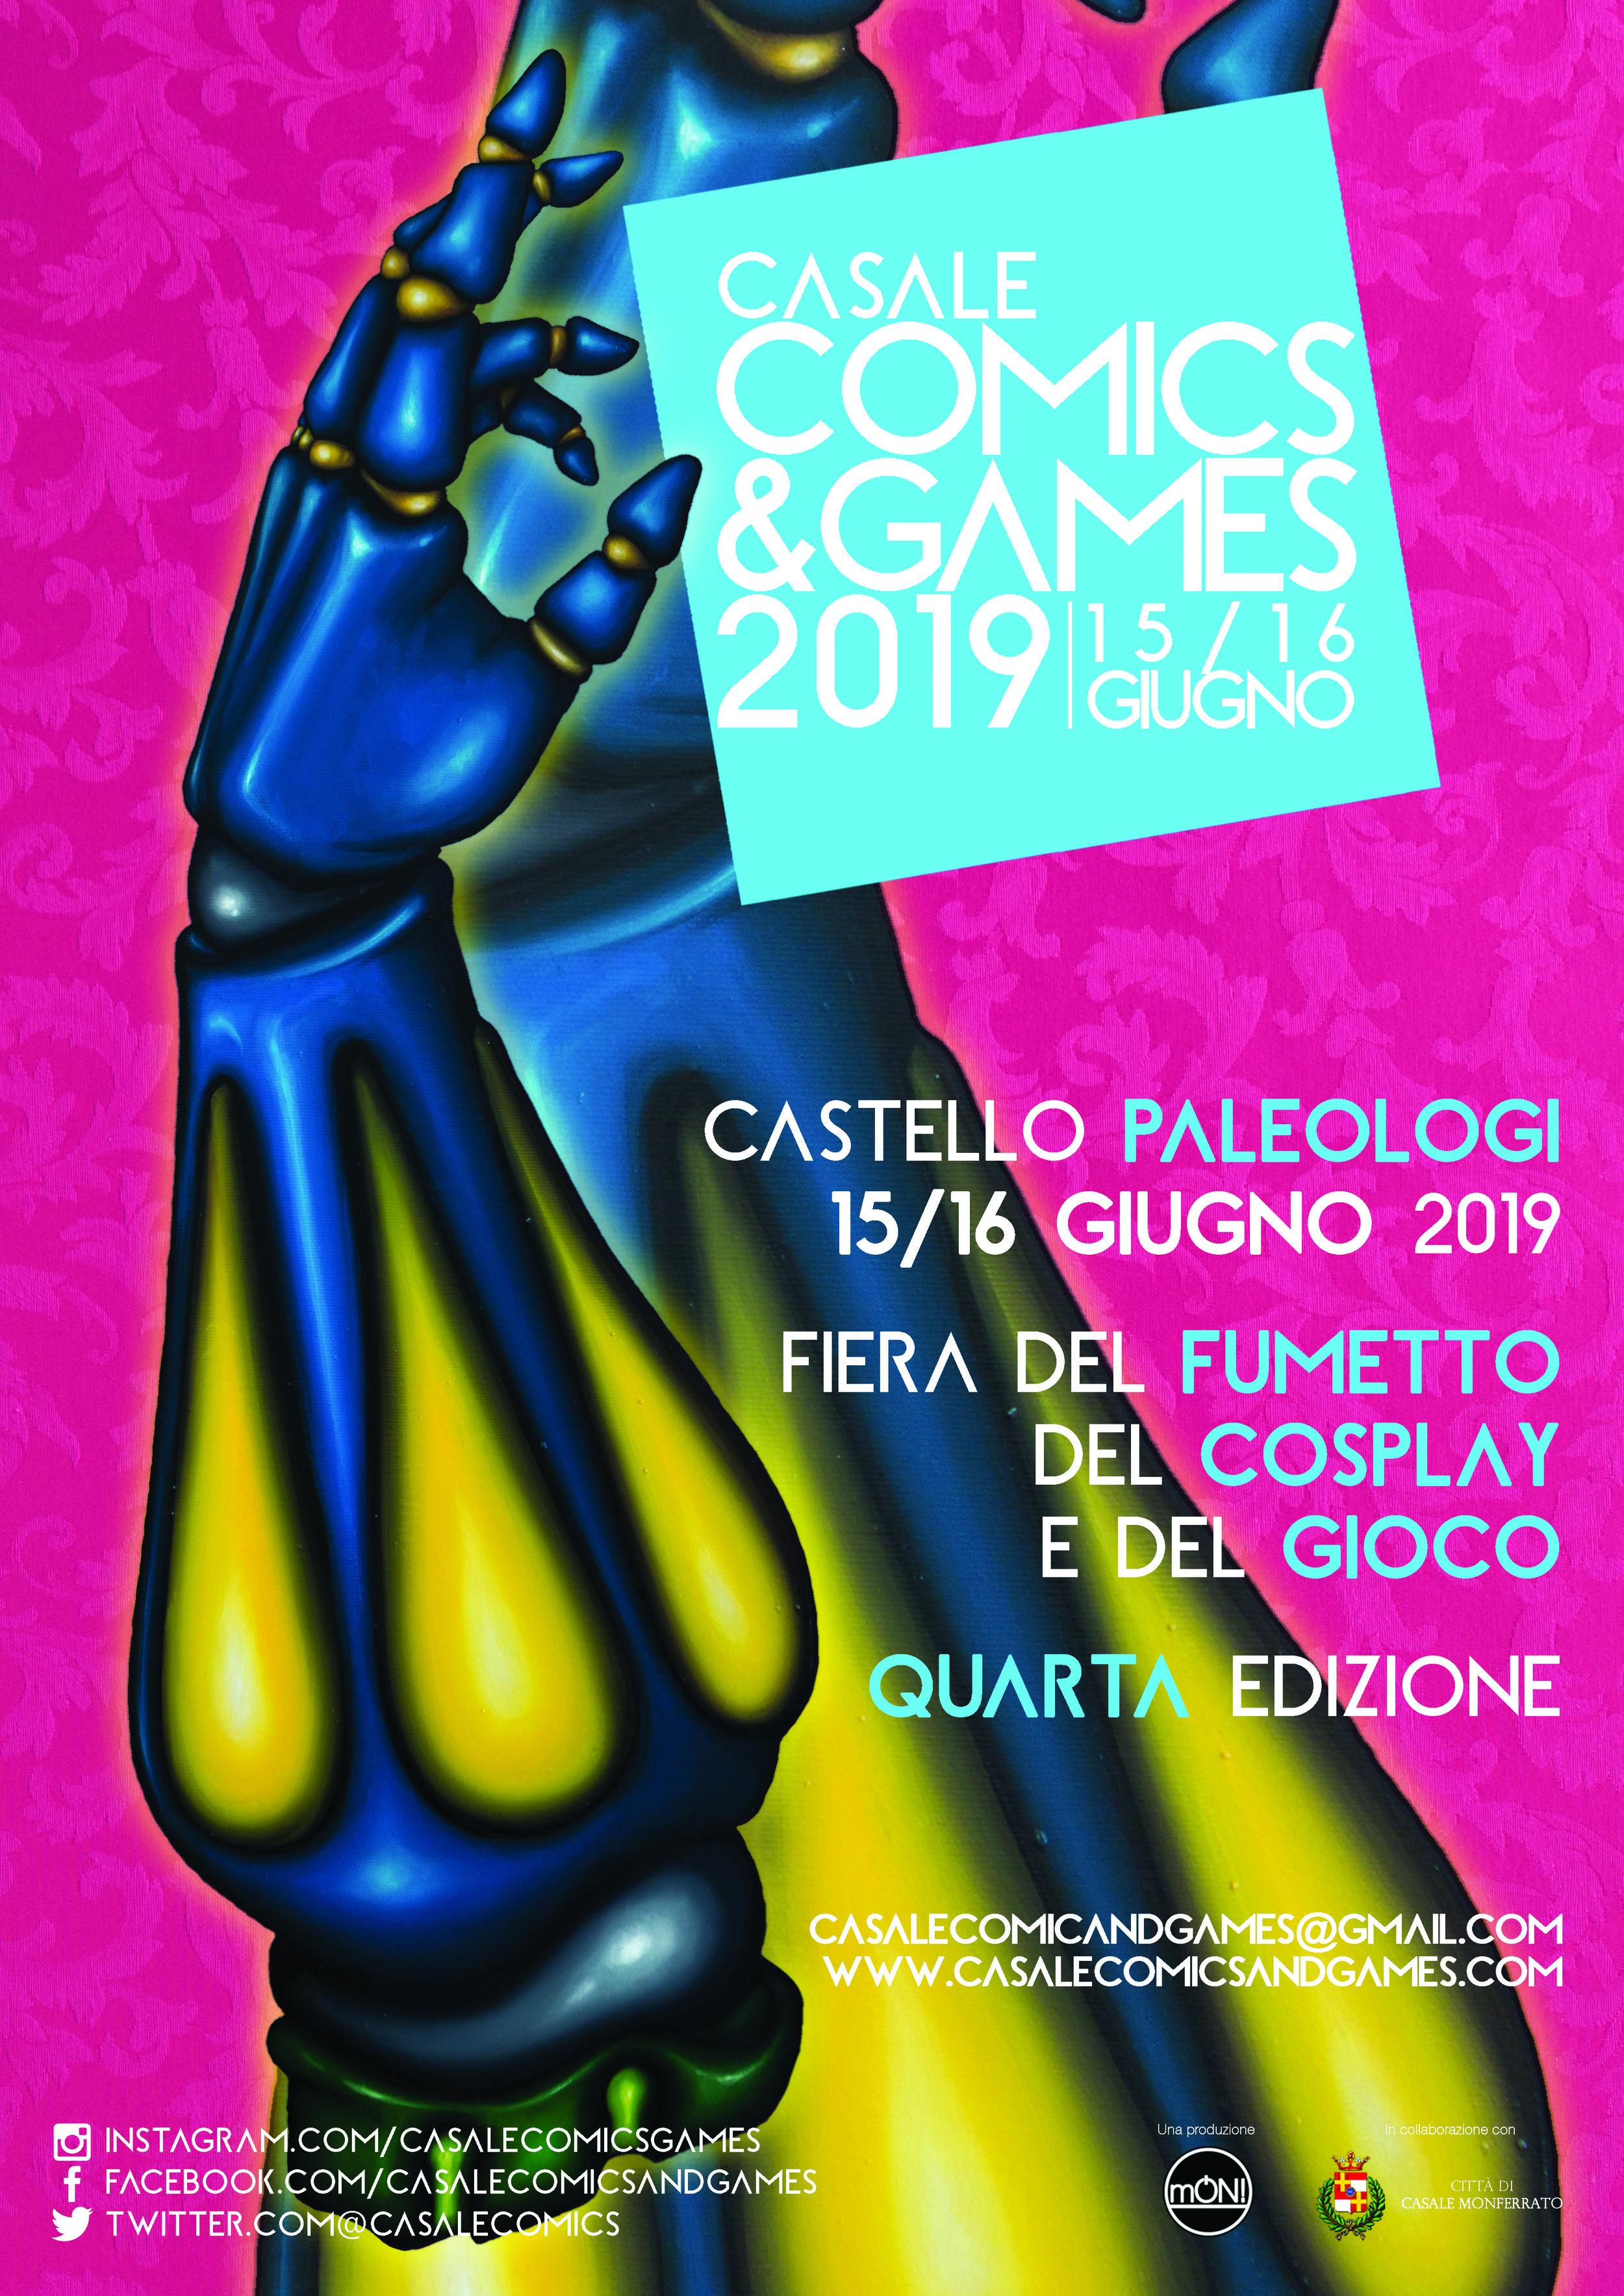 Locandina CCG 2019 cartoline provv.jpg